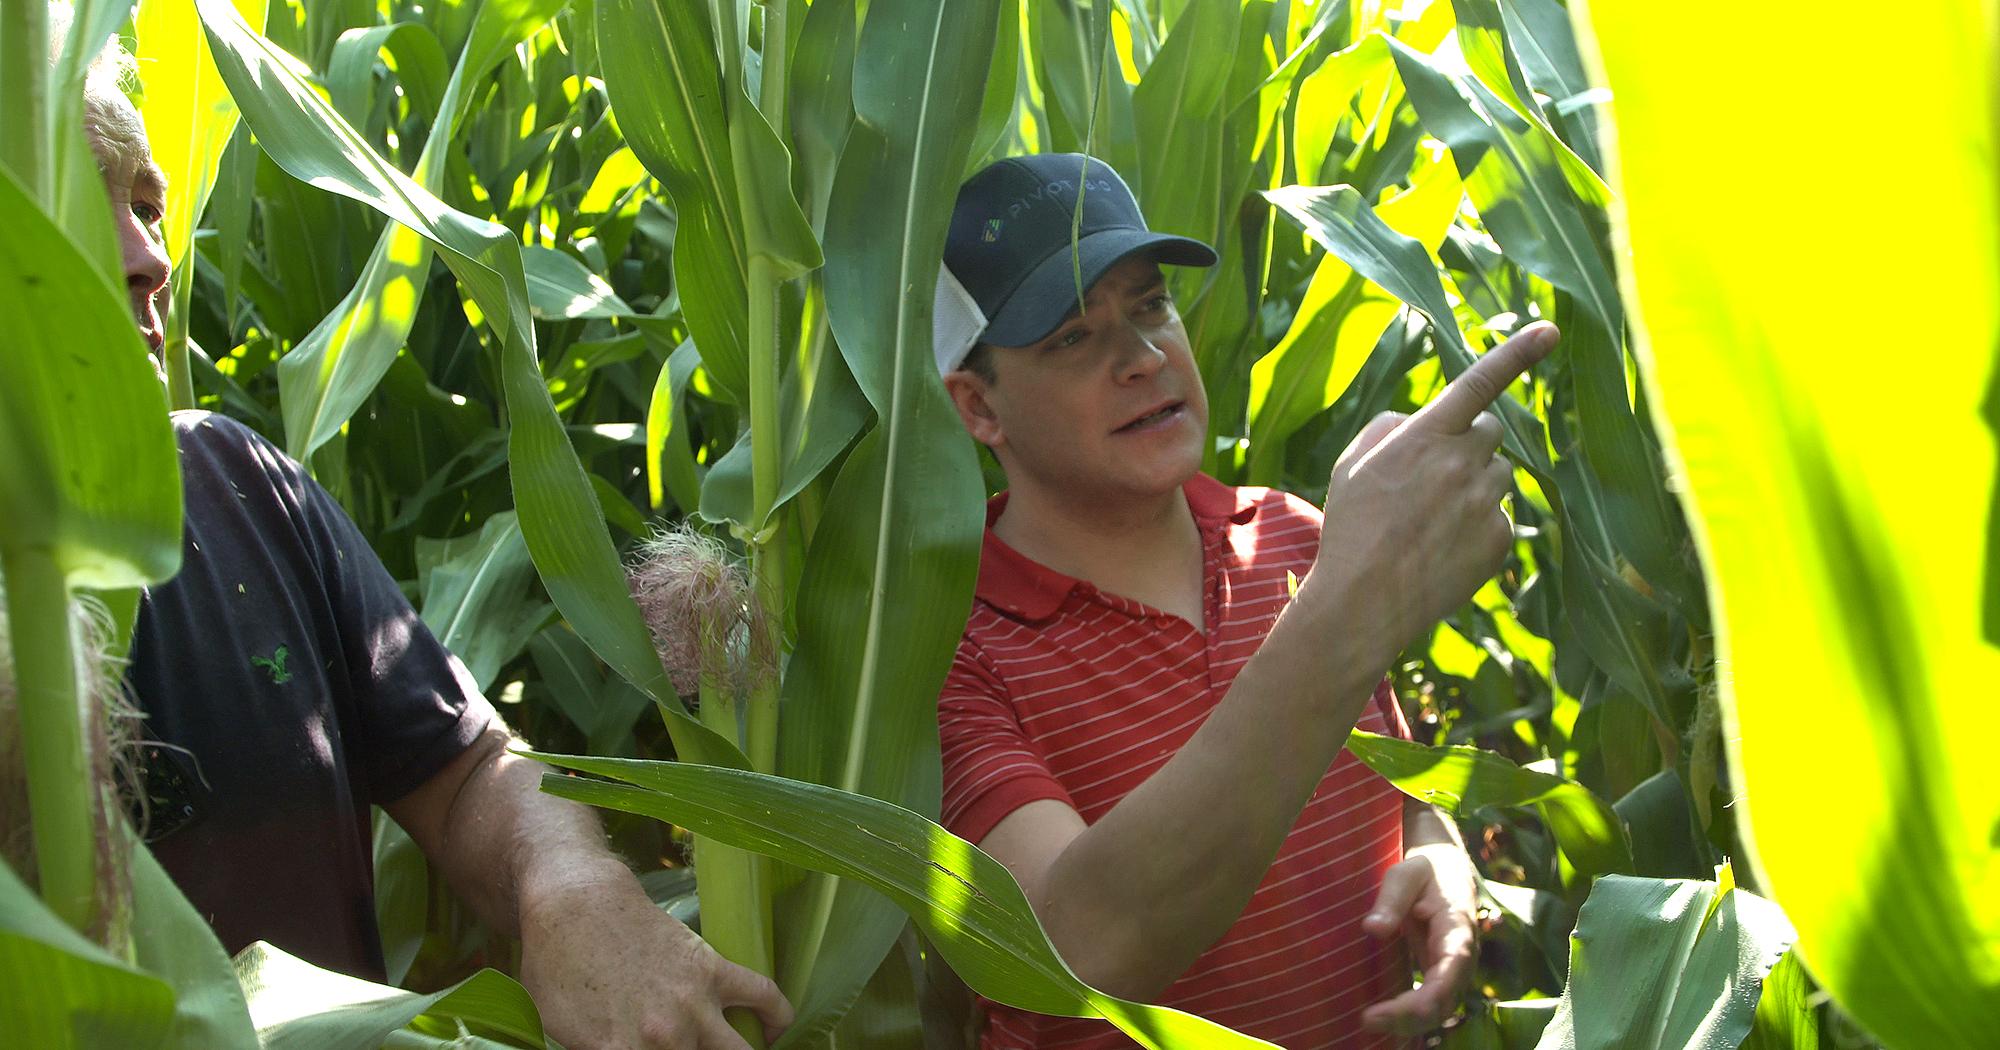 Pivot Bio co-founder and University of Iowa graduate Karsten Temme in a cornfield